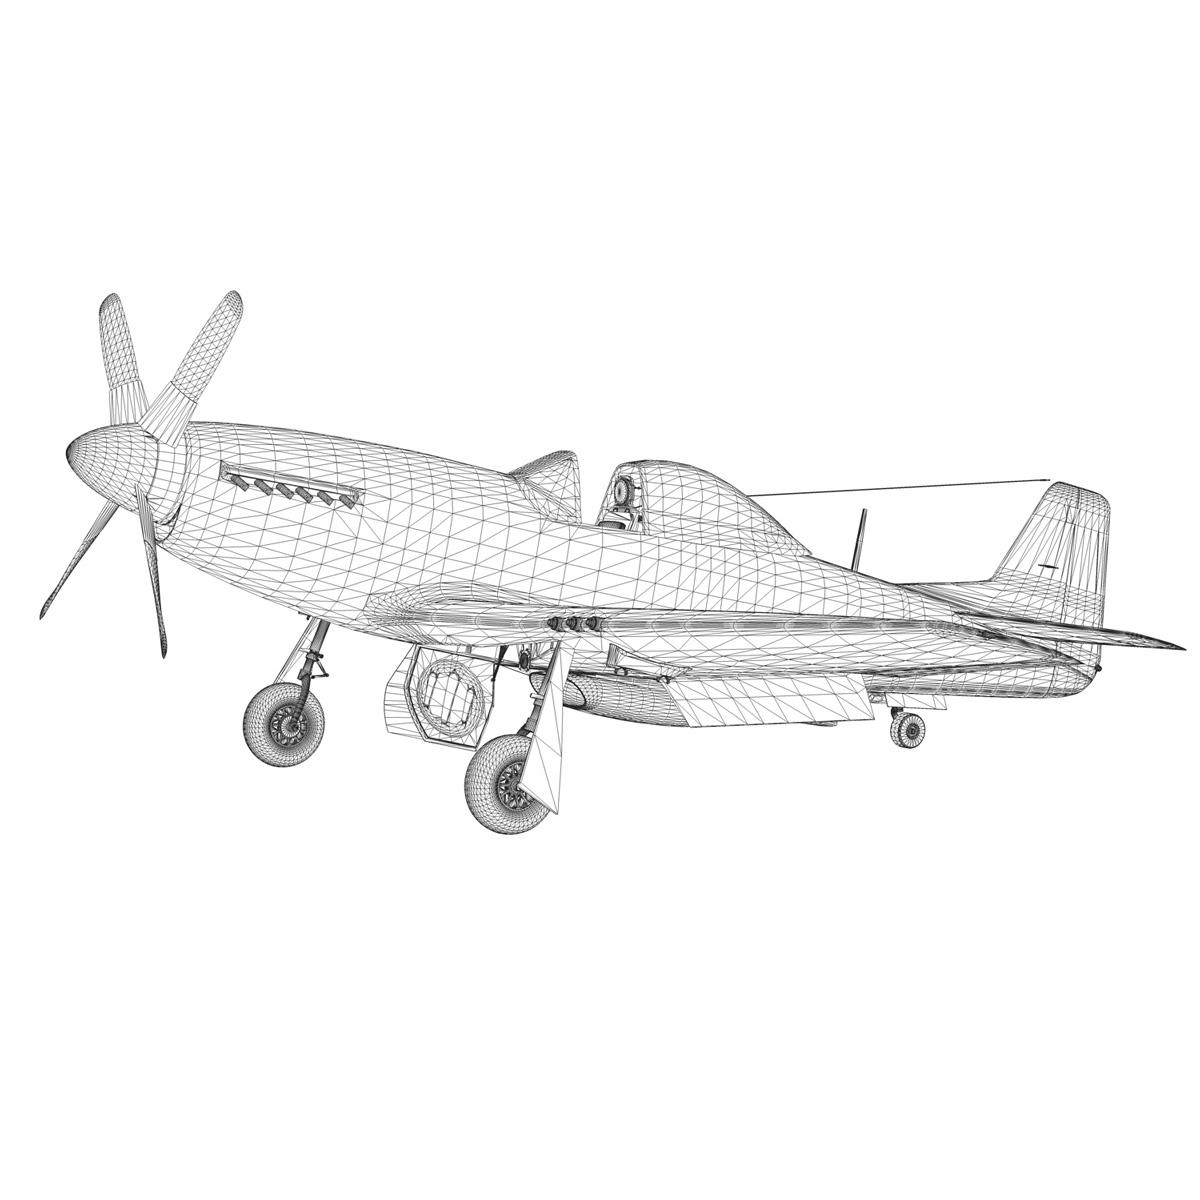 north american p-51d mustang – swedisch airforce 3d model fbx c4d lwo obj 268246